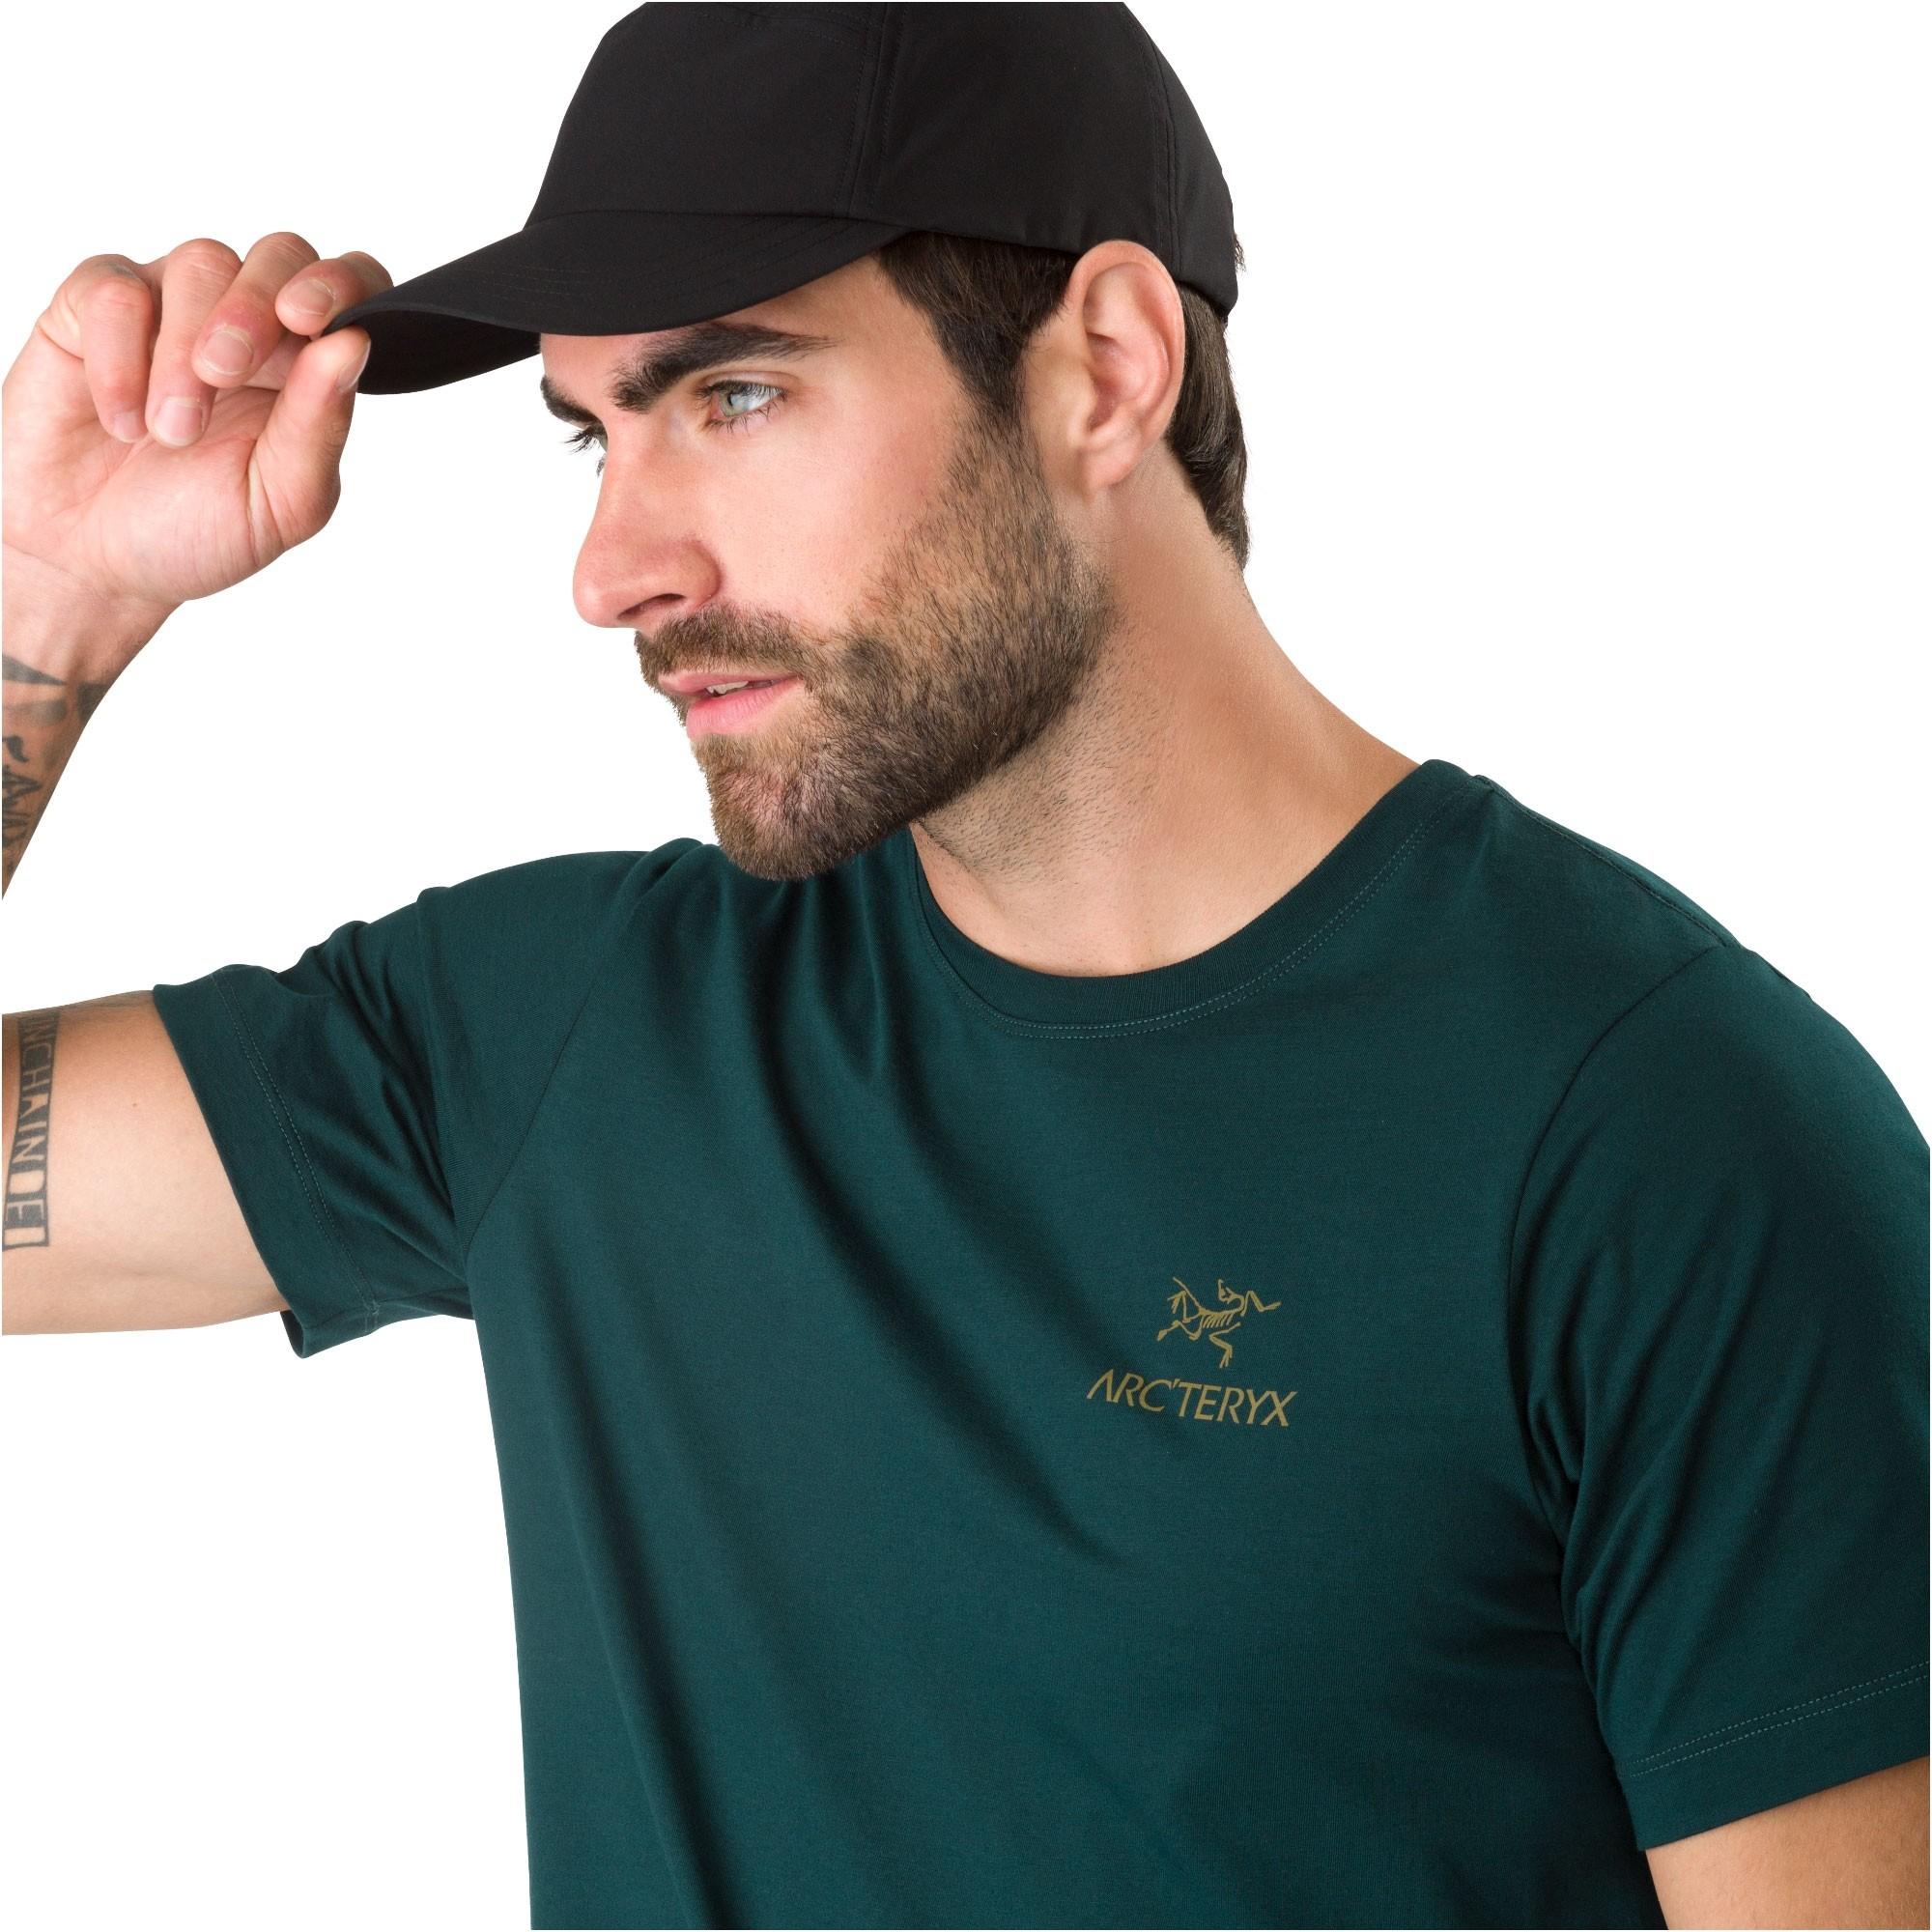 Arc'teryx Emblem T-Shirt - Labyrinth